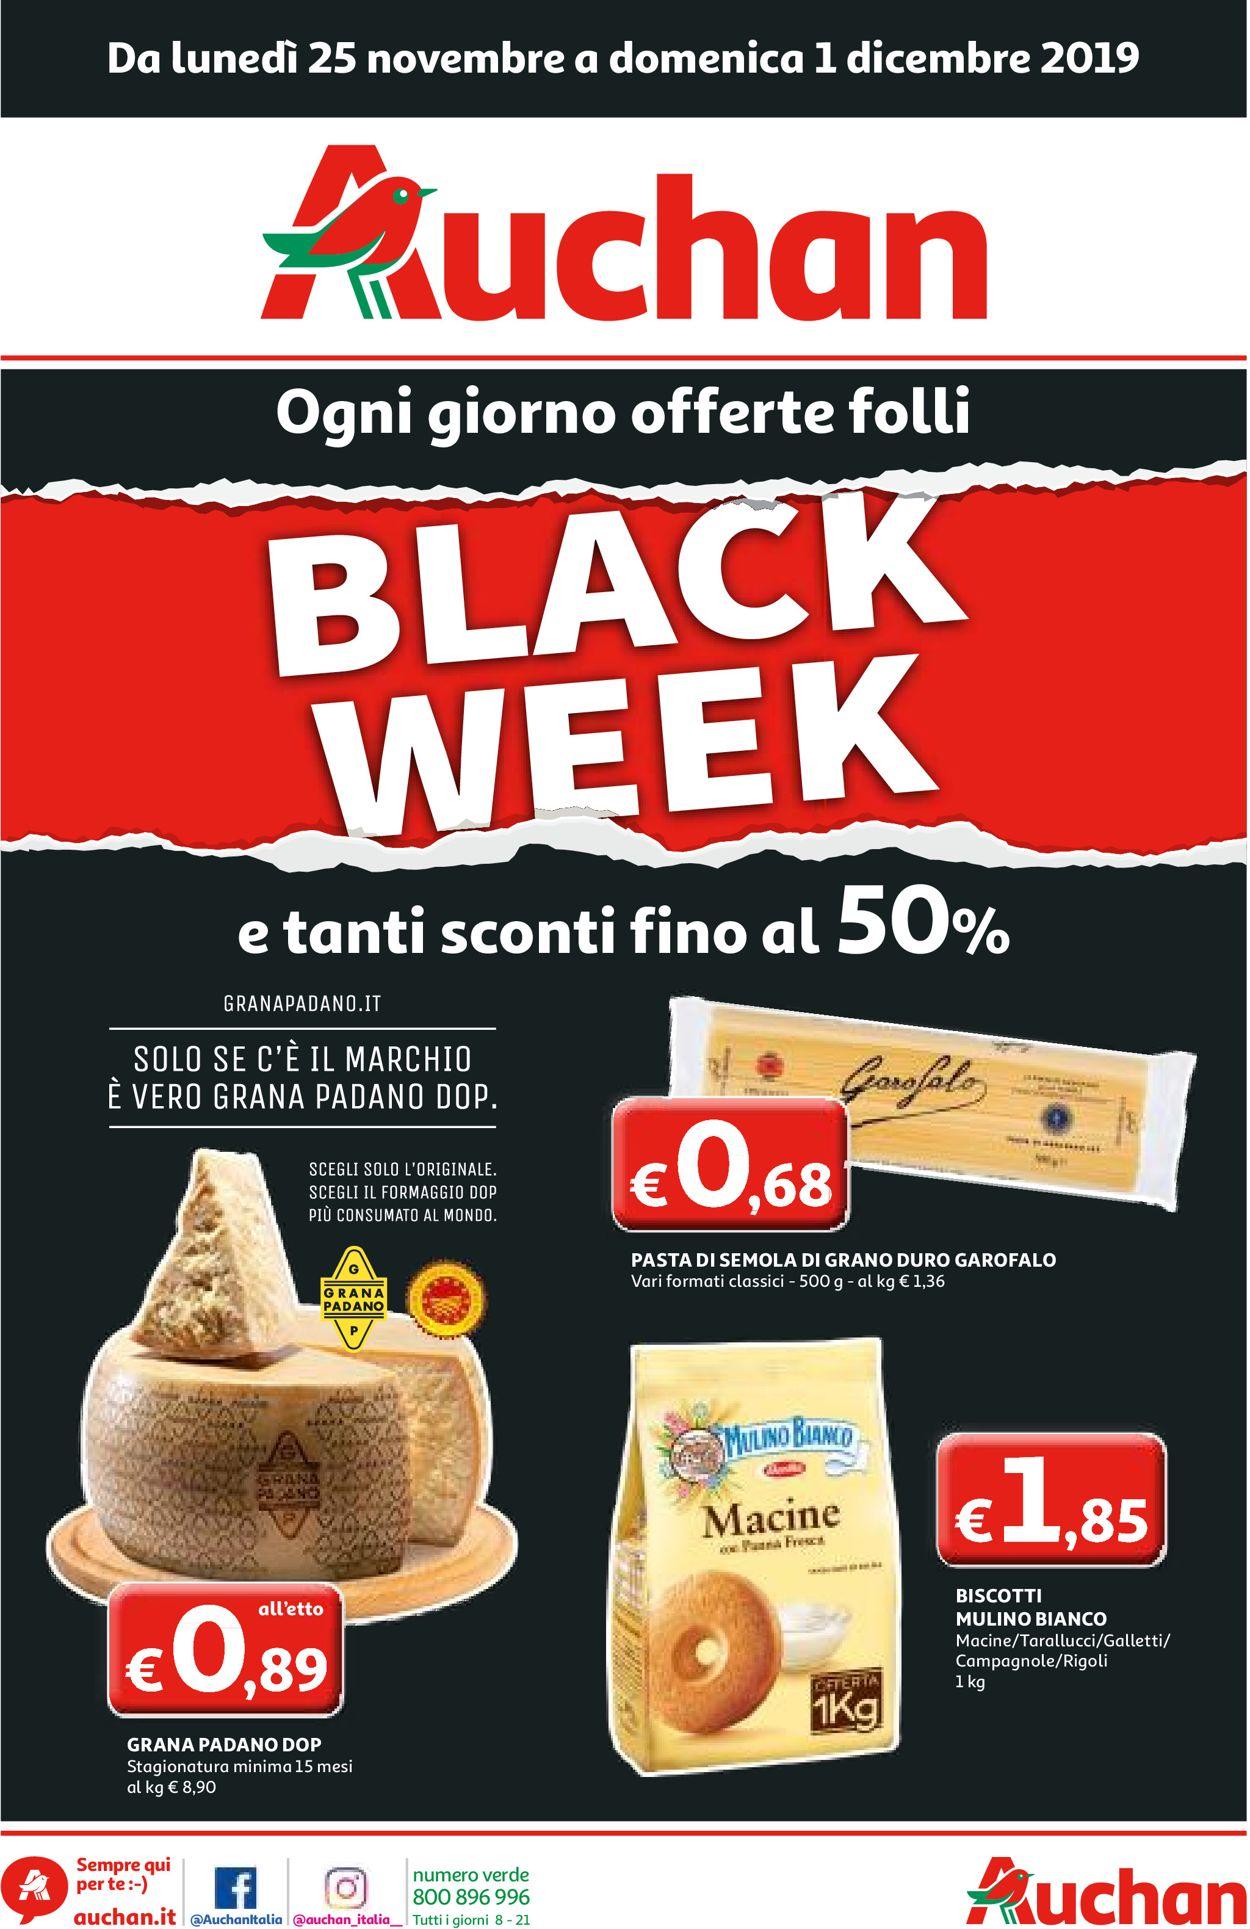 Volantino Auchan Black Friday 2019 - Offerte 25/11-01/12/2019